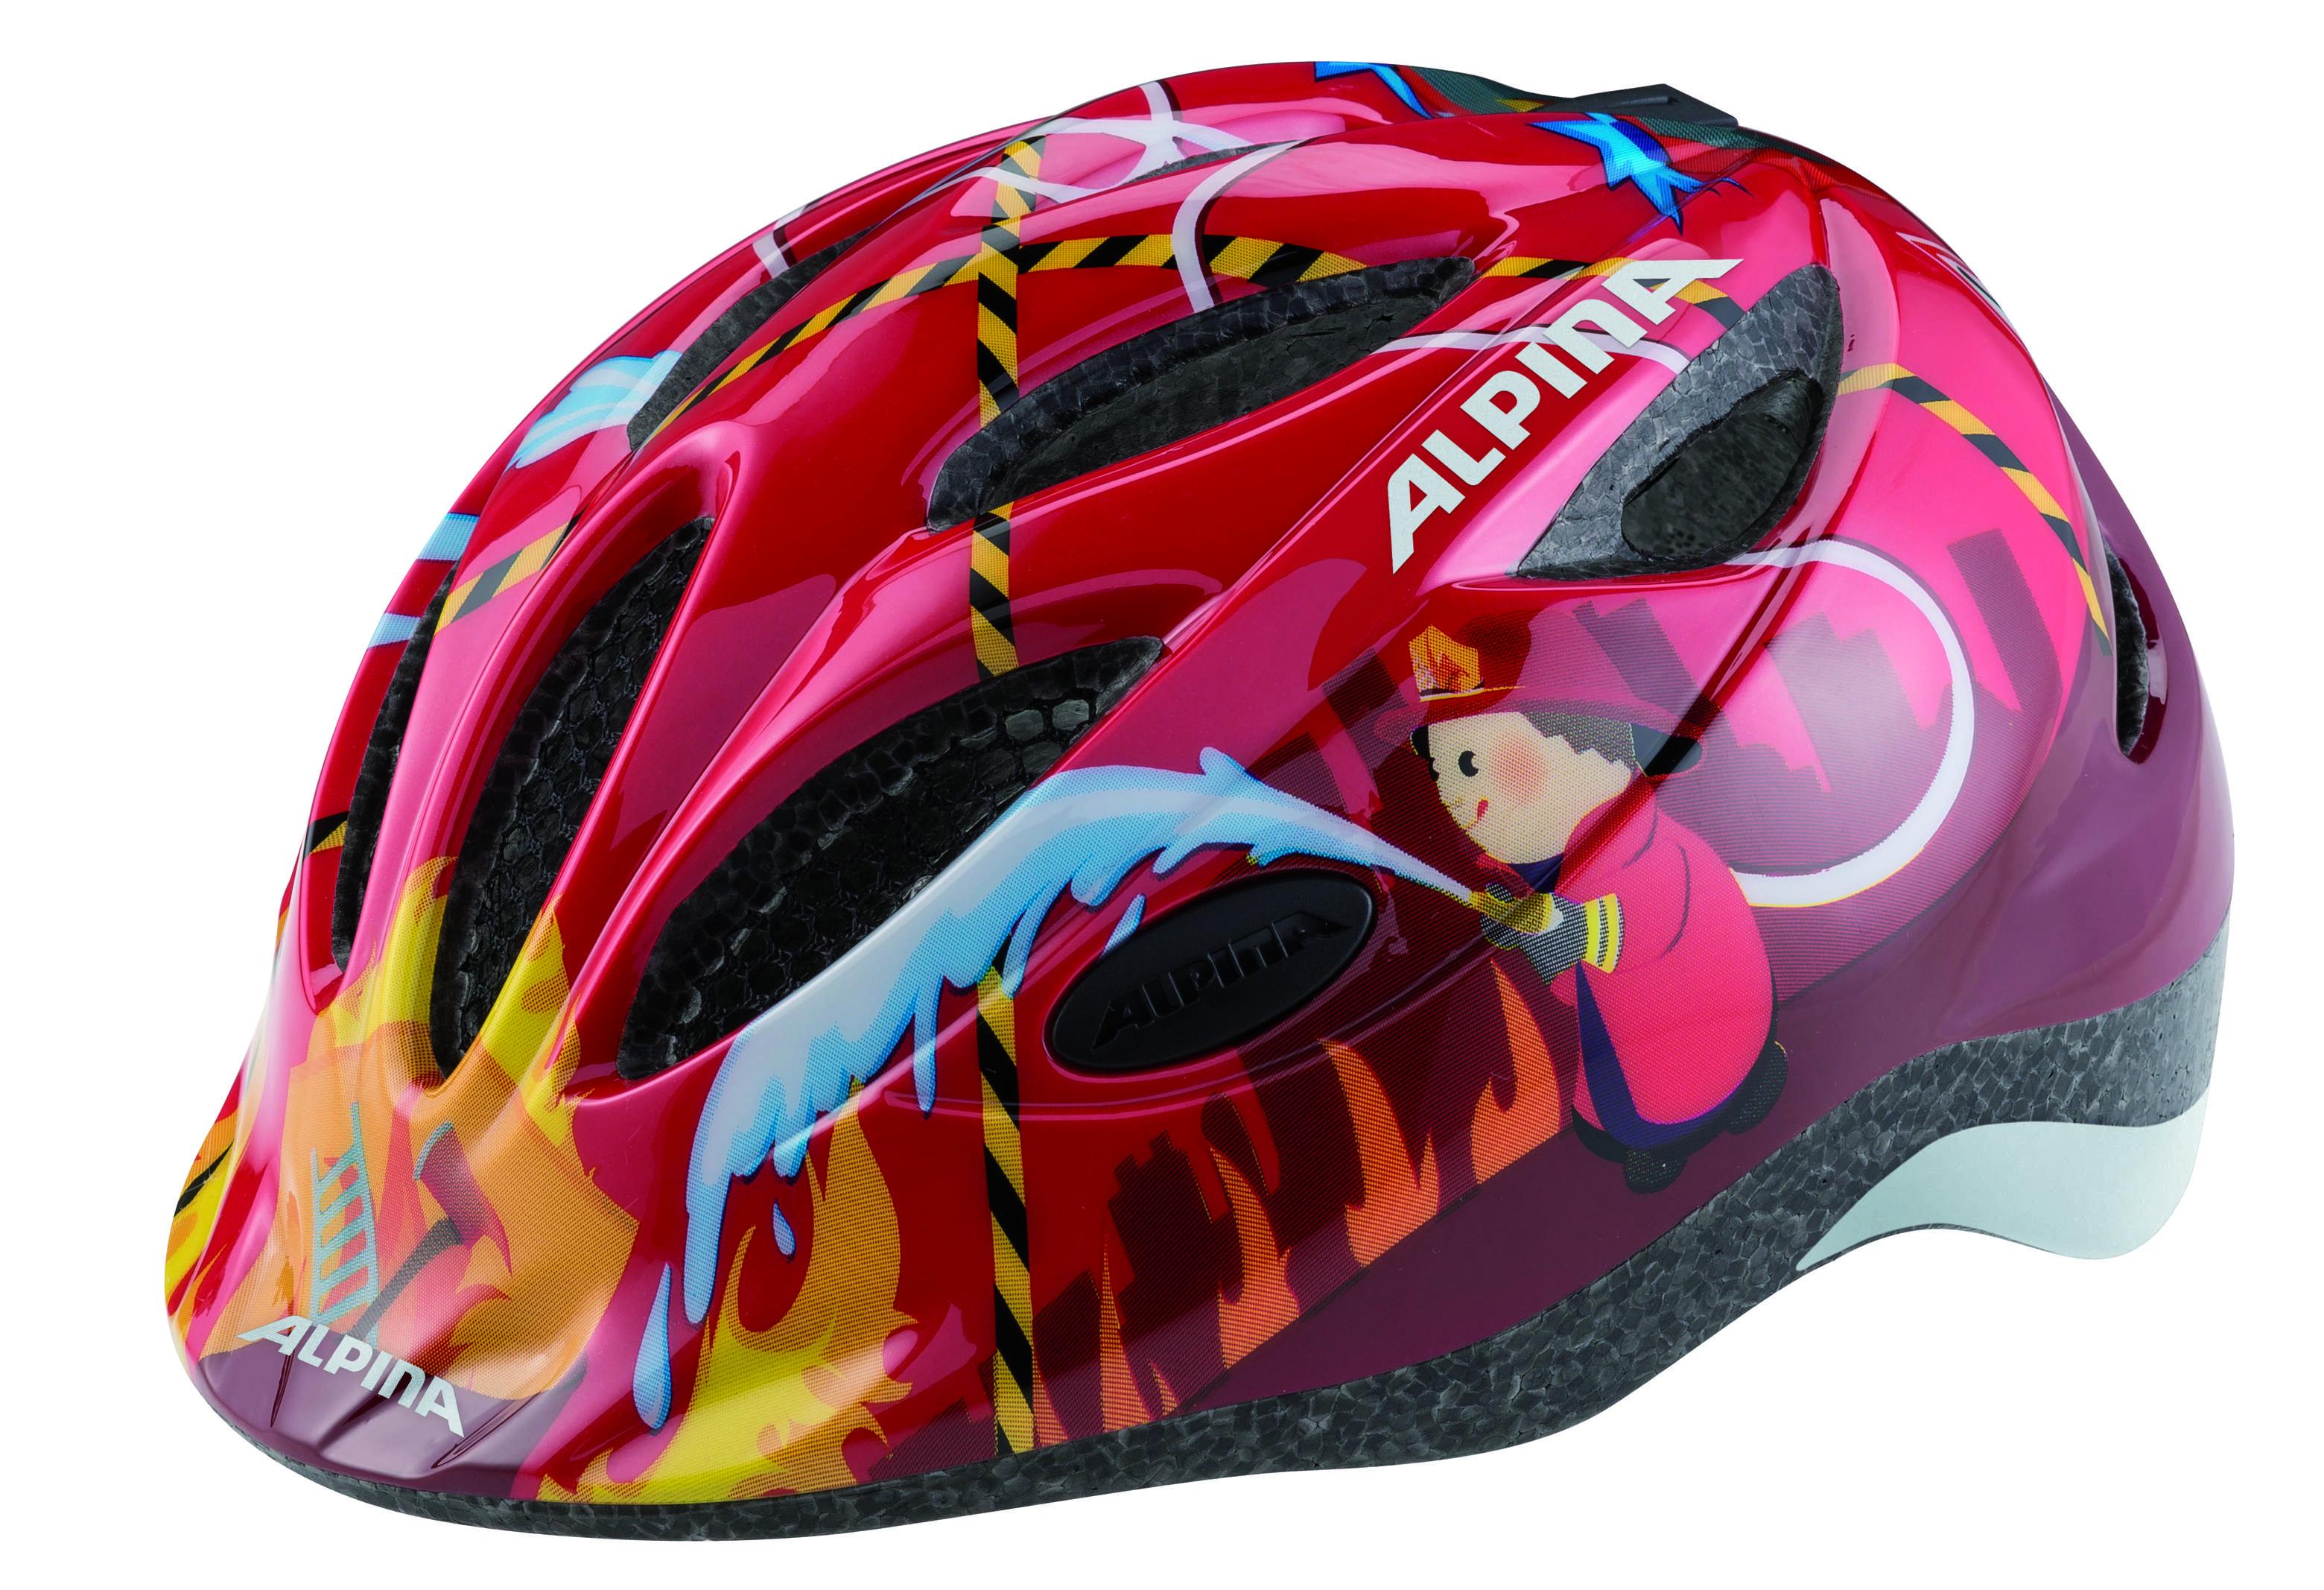 Летний шлем ALPINA JUNIOR / KIDS Gamma 2.0 red firefighter